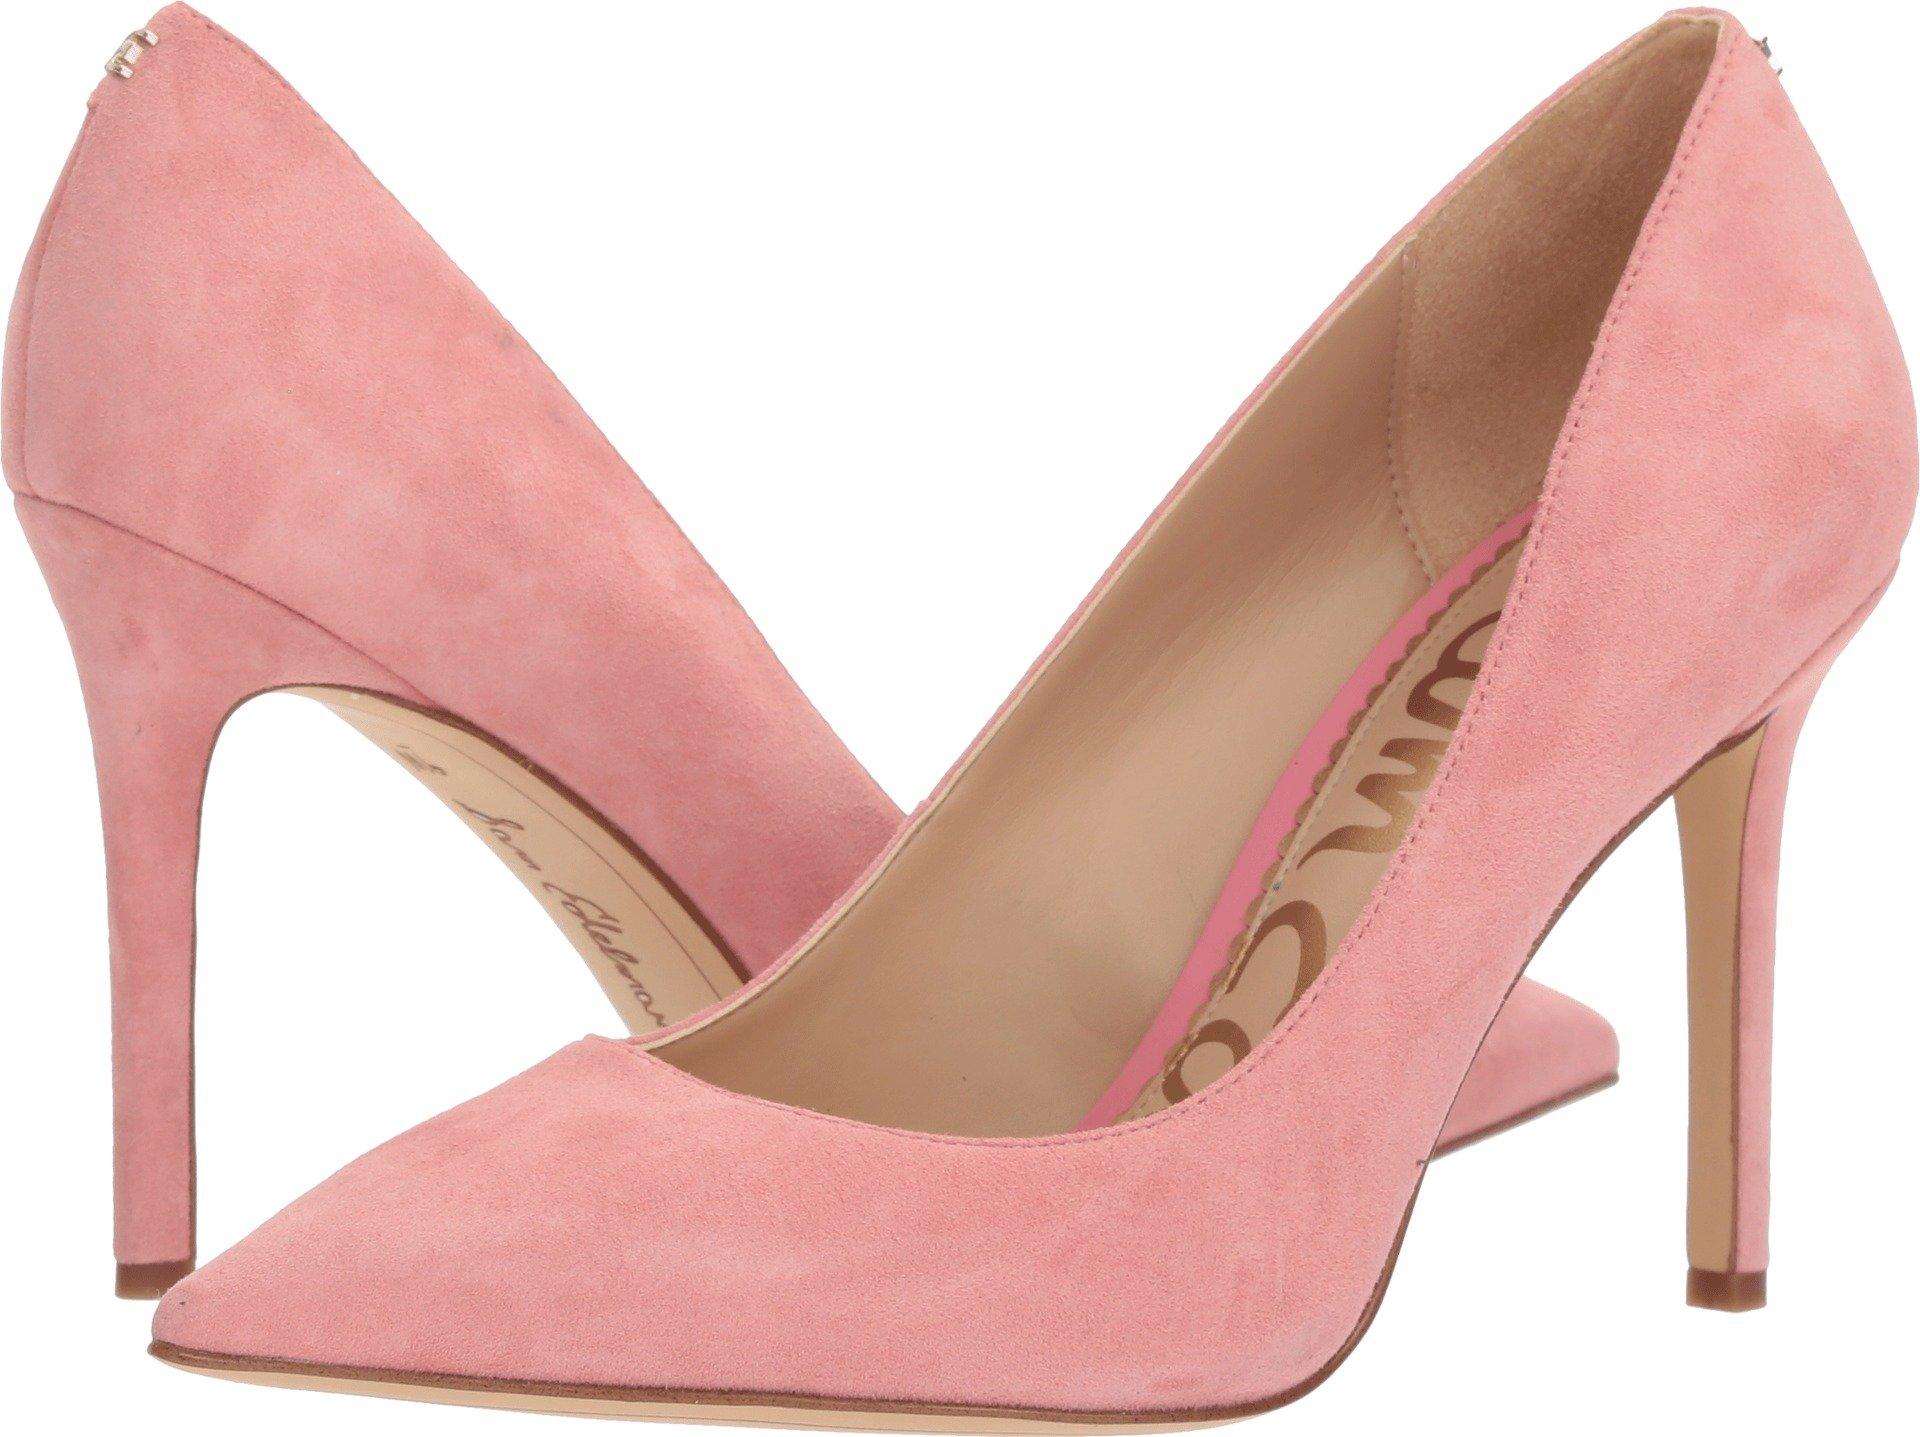 Sam Edelman Women's Hazel Pumps, Pink Lemonade, 4.5 B(M) US